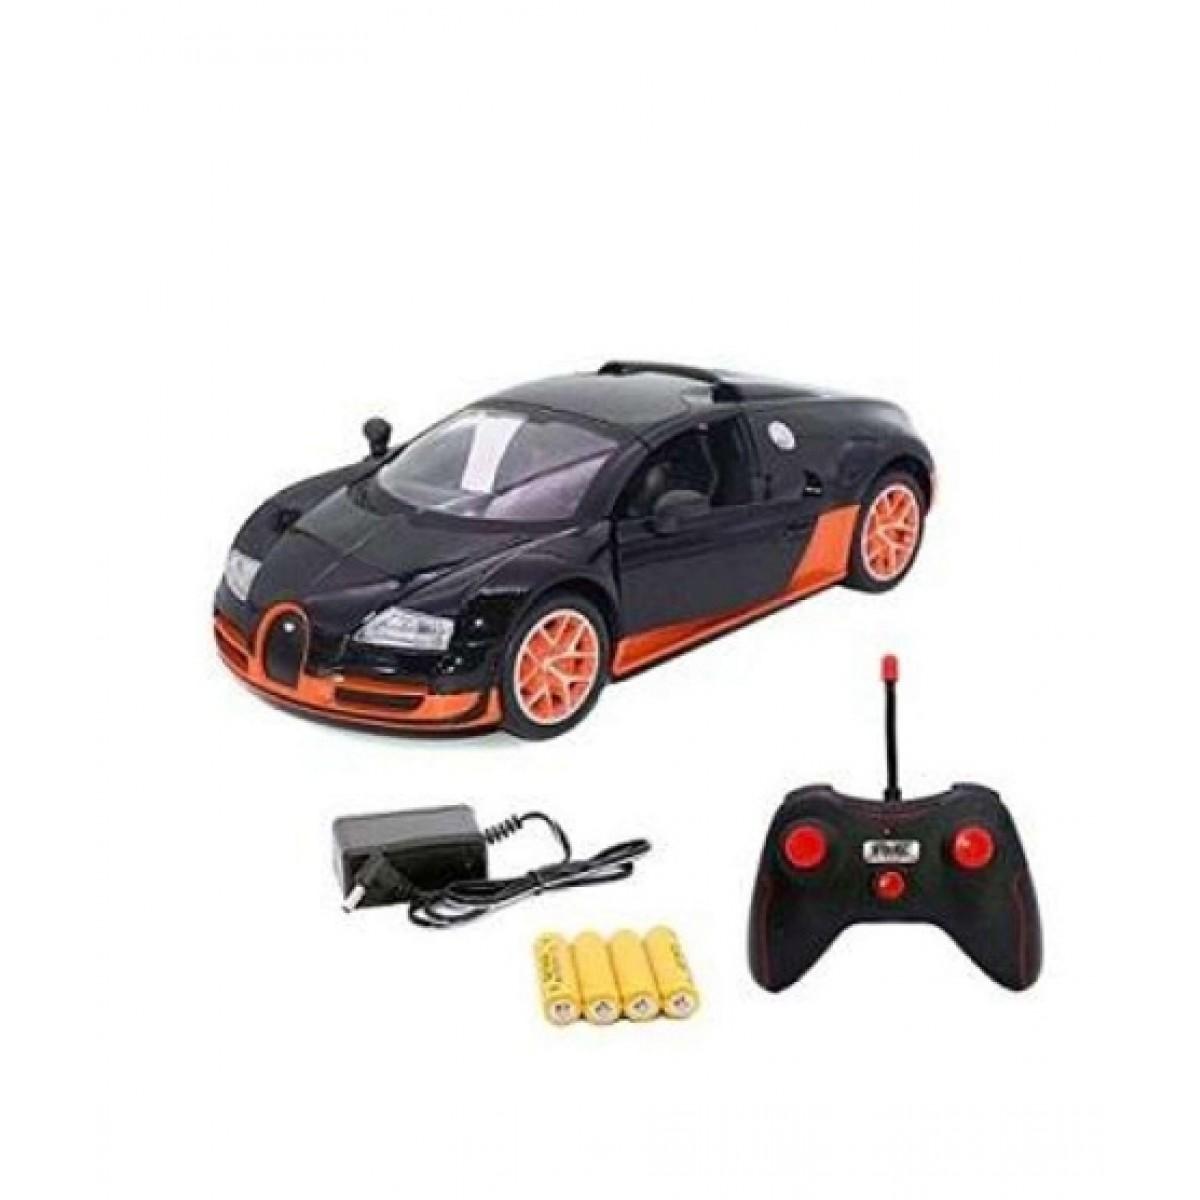 Btl Bugatii Remote Control Rc Car For Kids Price In Pakistan Buy Btl Bugatii Remote Control Rc Car For Kids Ishopping Pk